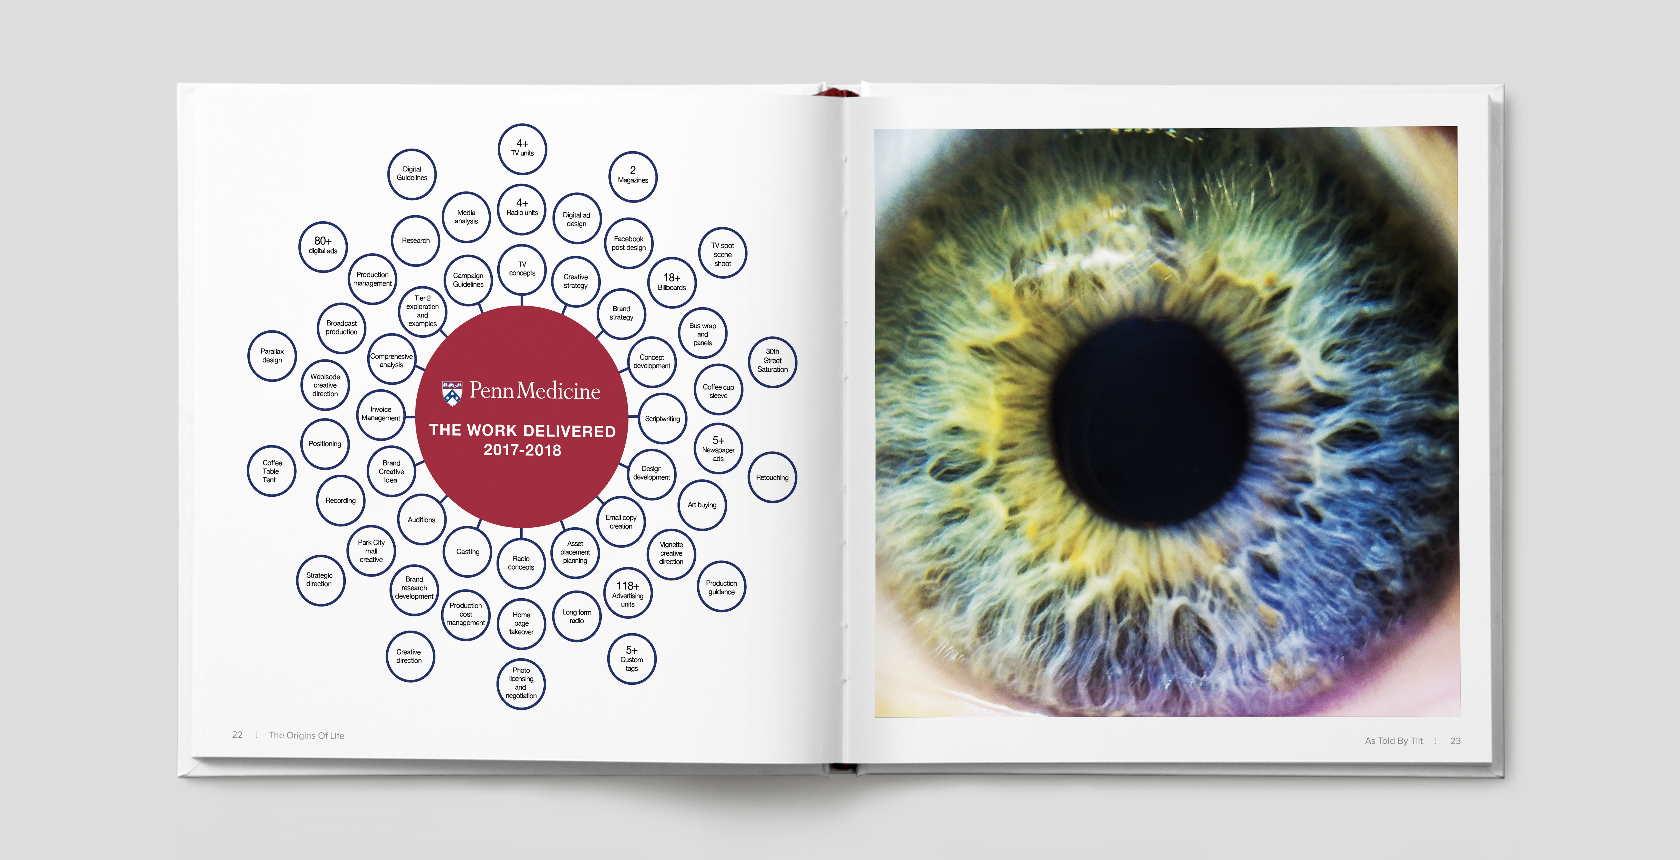 Penn_Medicine_Image_Gallery_Life_Book_3.jpg